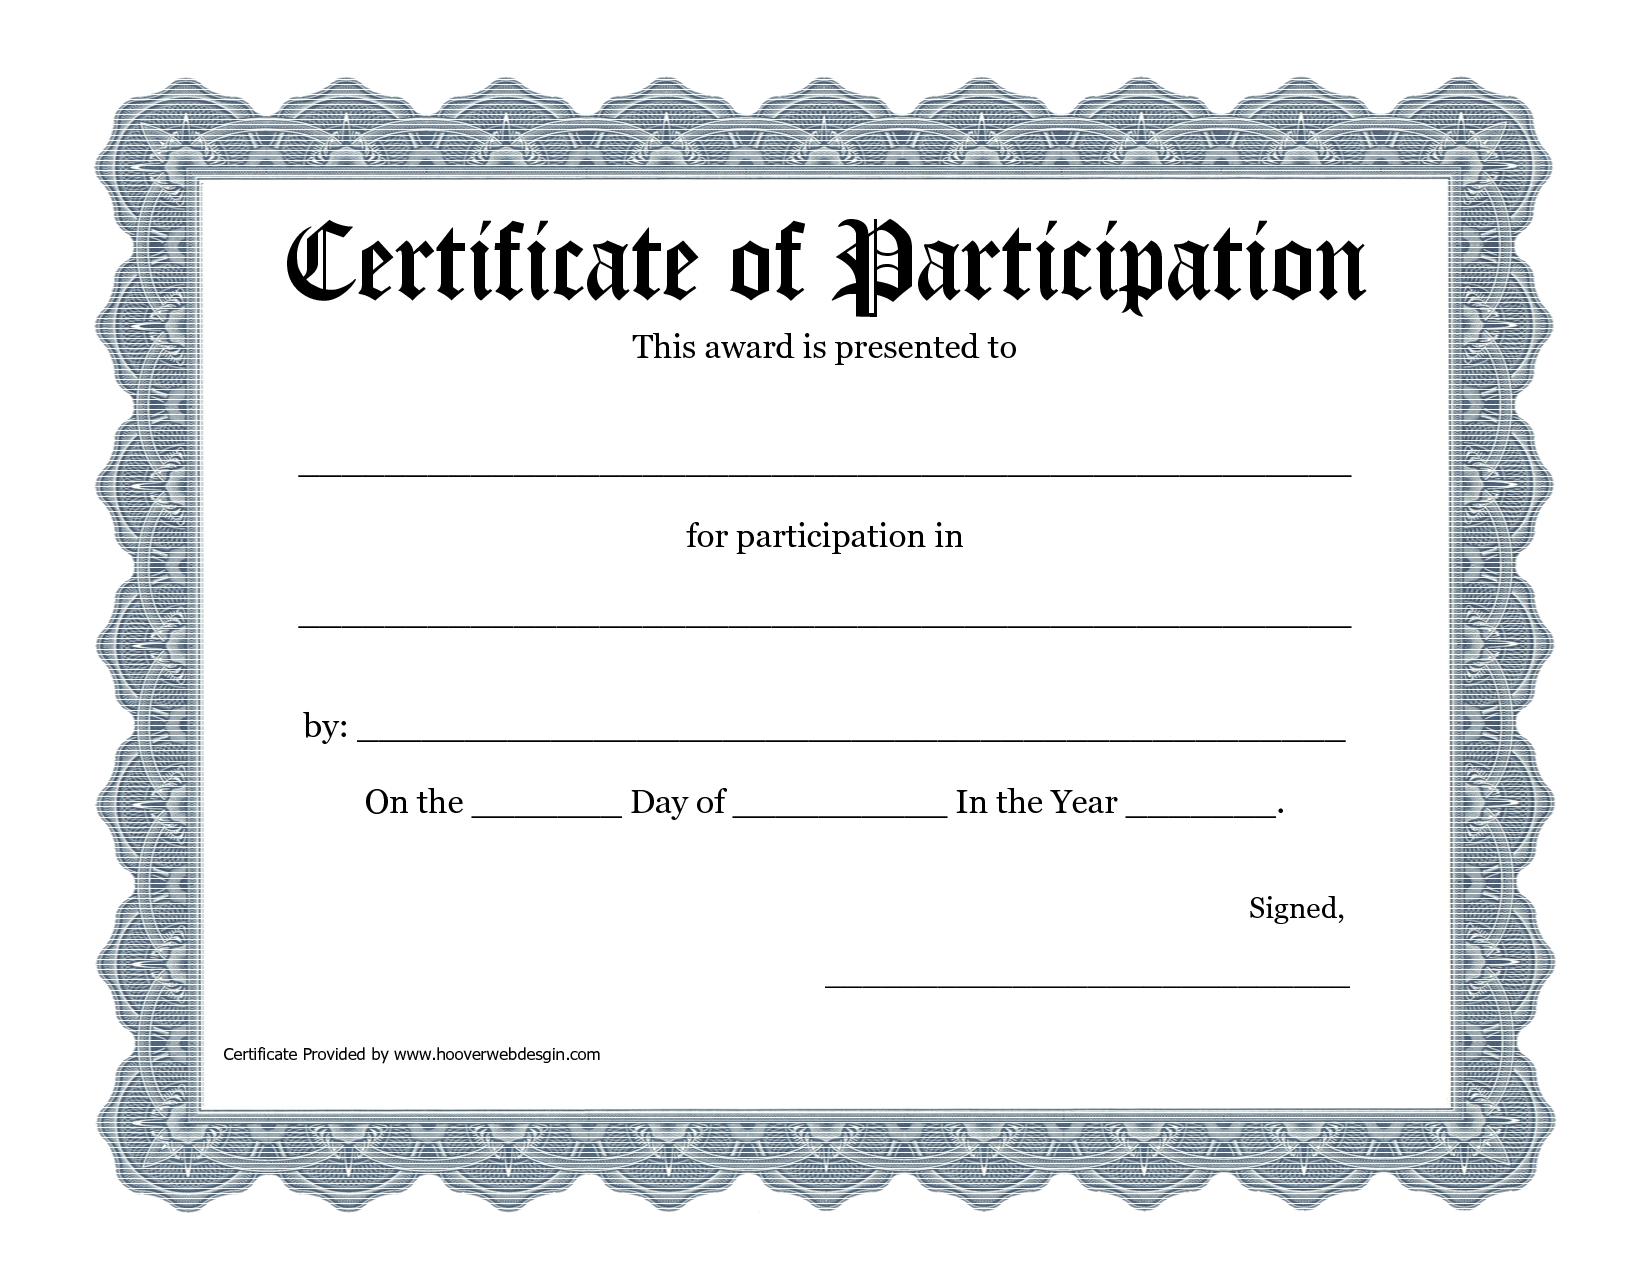 Free Printable Award Certificate Template - Bing Images | 2016 Art - Sports Certificate Templates Free Printable